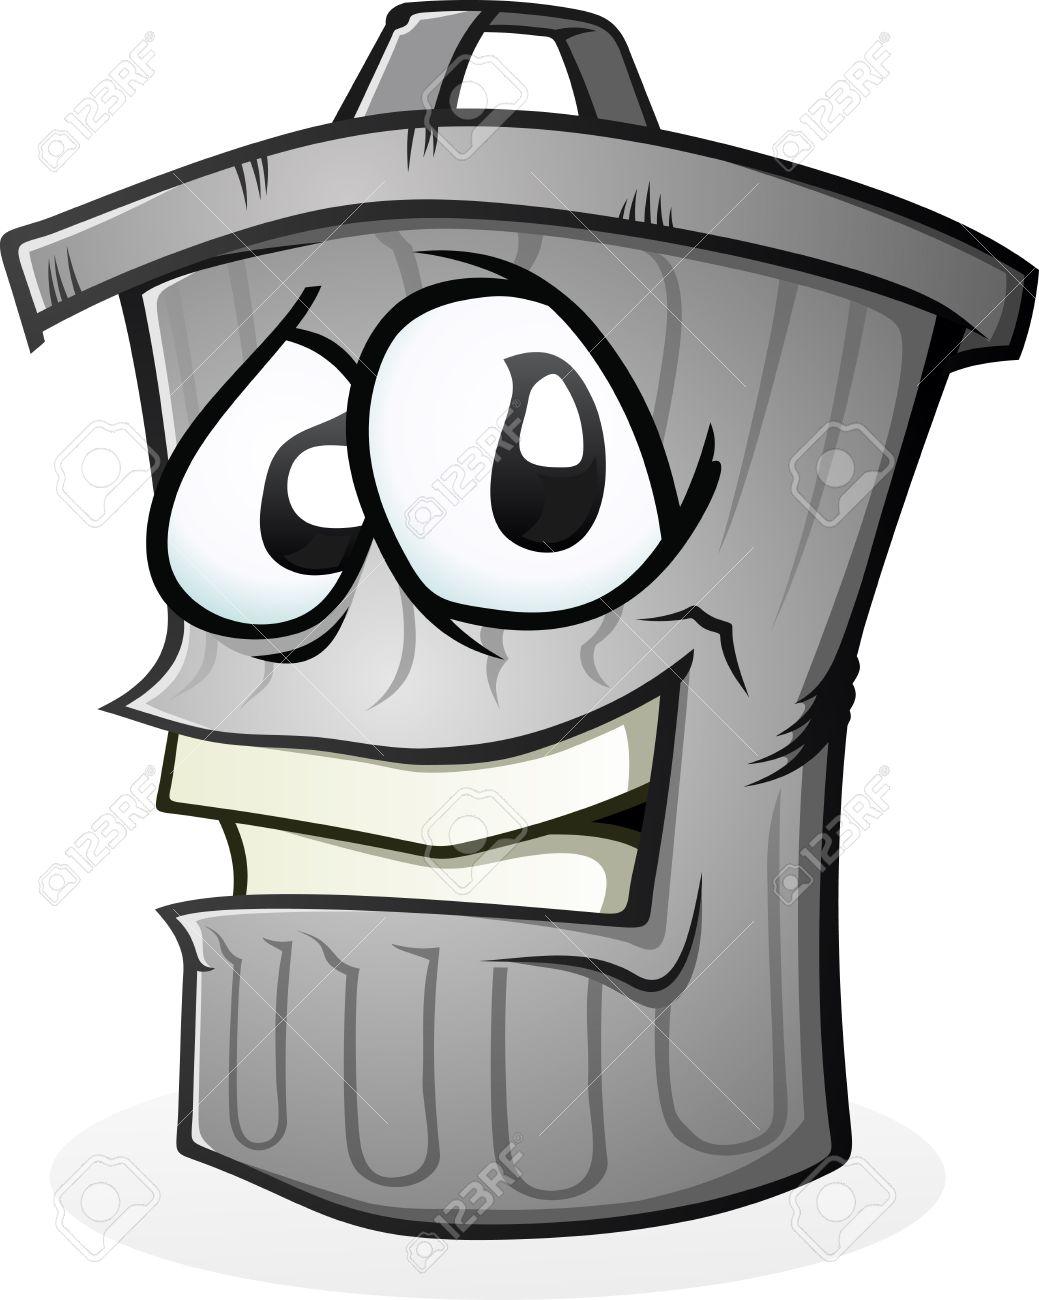 Trash Can Clean Cartoon Character - 35517115